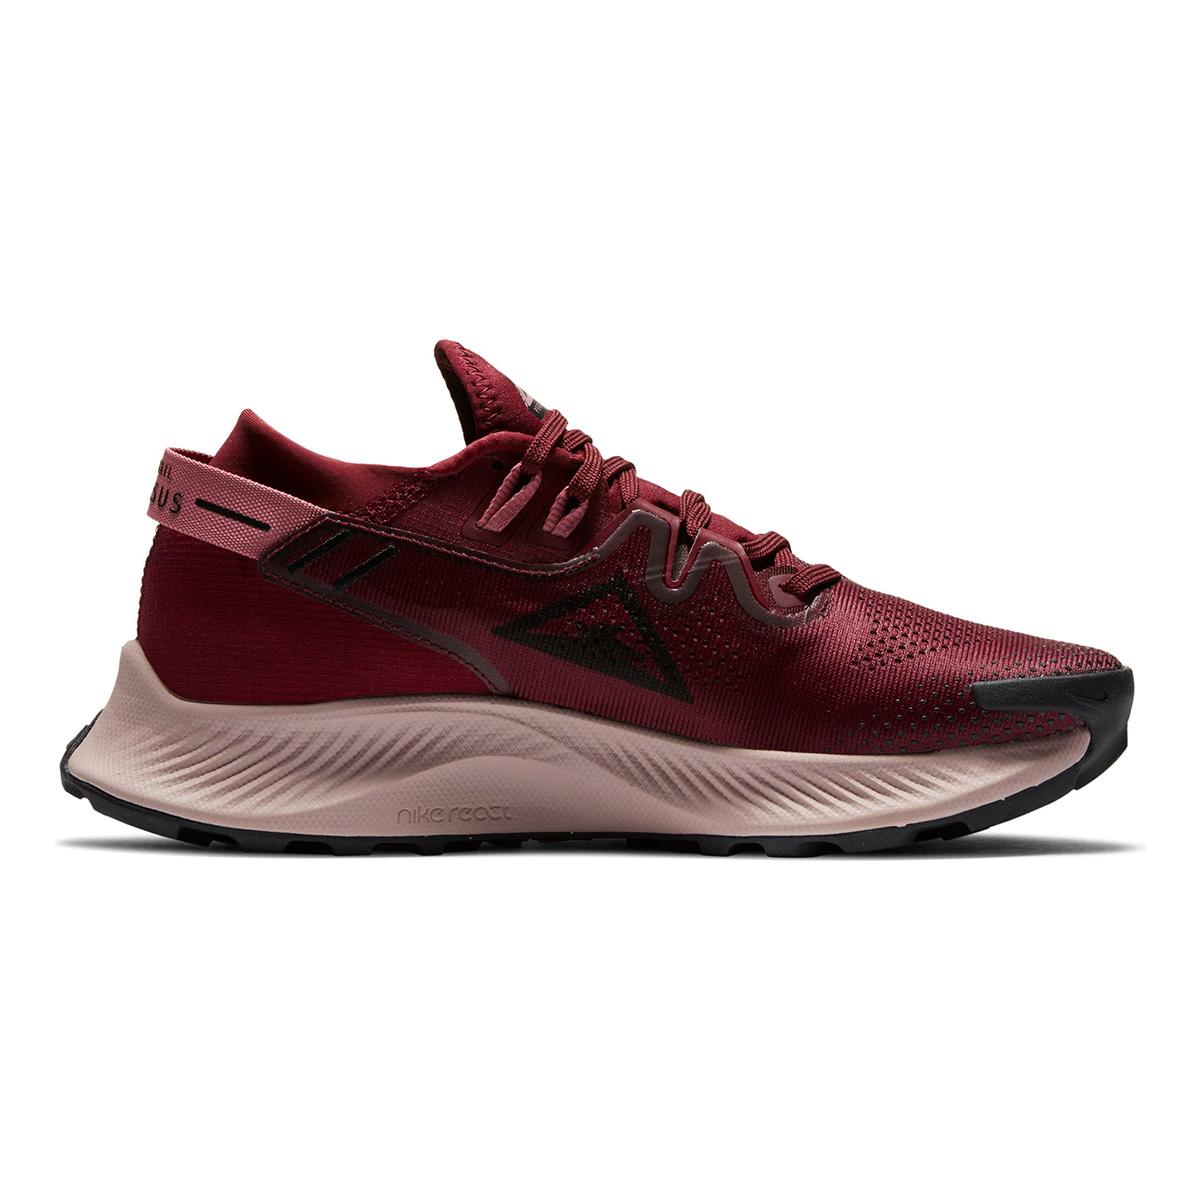 Women's Nike Pegasus Trail 2 Trail Running Shoe - Color: Dark Beetroot/Desert Berry/Platinum Tint/Black - Size: 5 - Width: Regular, Dark Beetroot/Desert Berry/Platinum Tint/Black, large, image 2